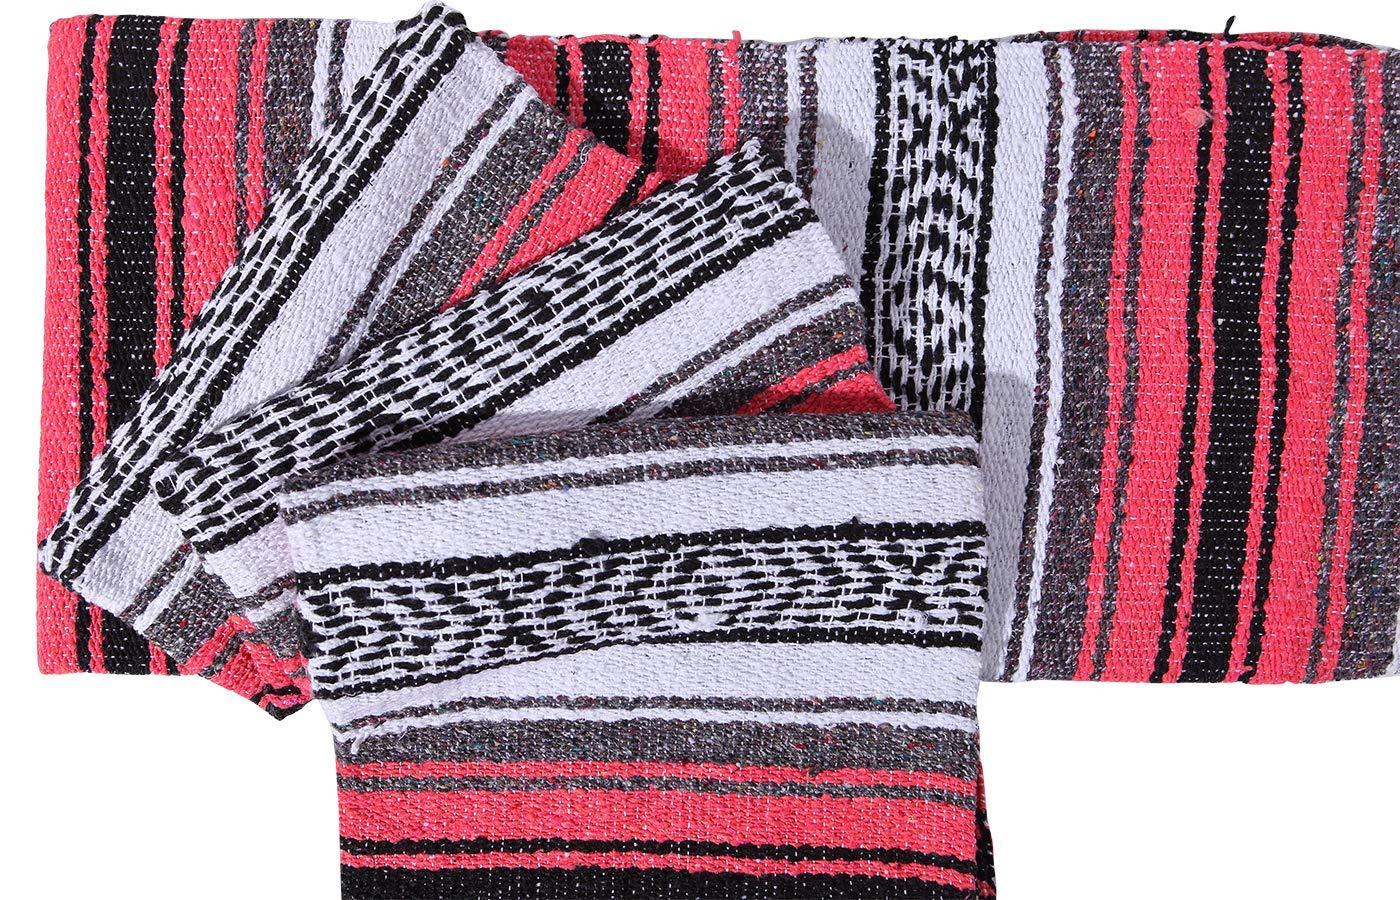 El Paso Designs Genuine Mexican Falsa Blanket - Yoga Studio Blanket, Colorful, Soft Woven Serape Imported from Mexico (Bright Coral) by El Paso Designs (Image #4)